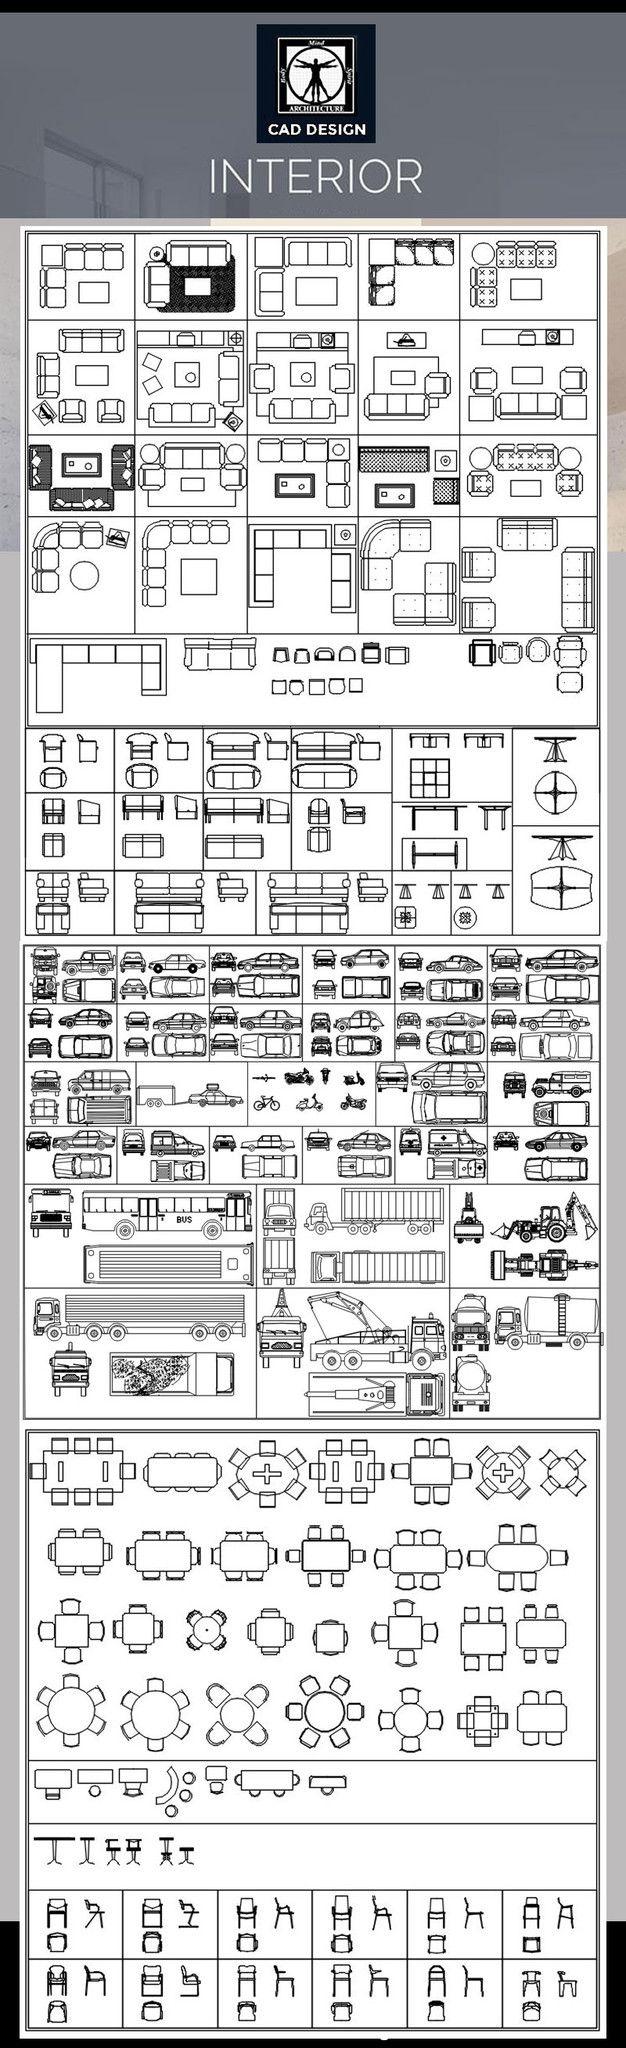 All Interior Design Blocks 4 U2013 CAD Design   Free CAD Blocks,Drawings,Details